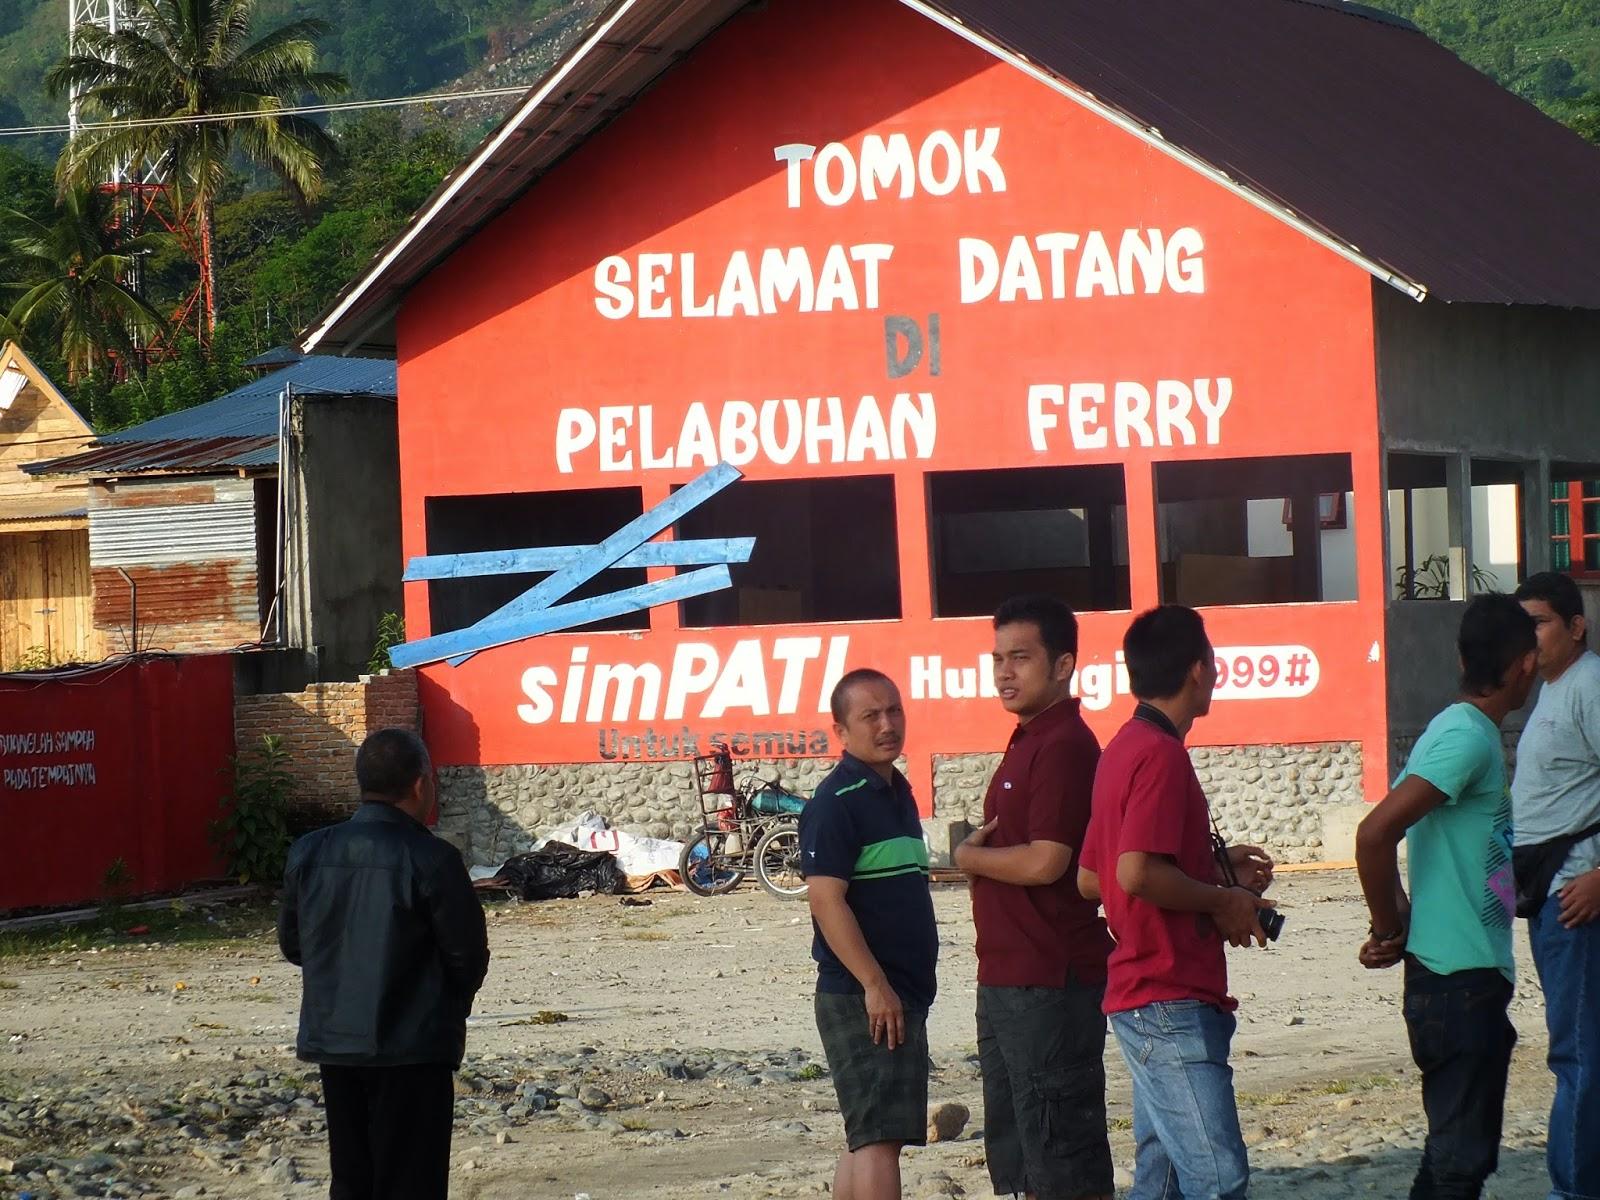 pelabuhan ferry tomok, samosir